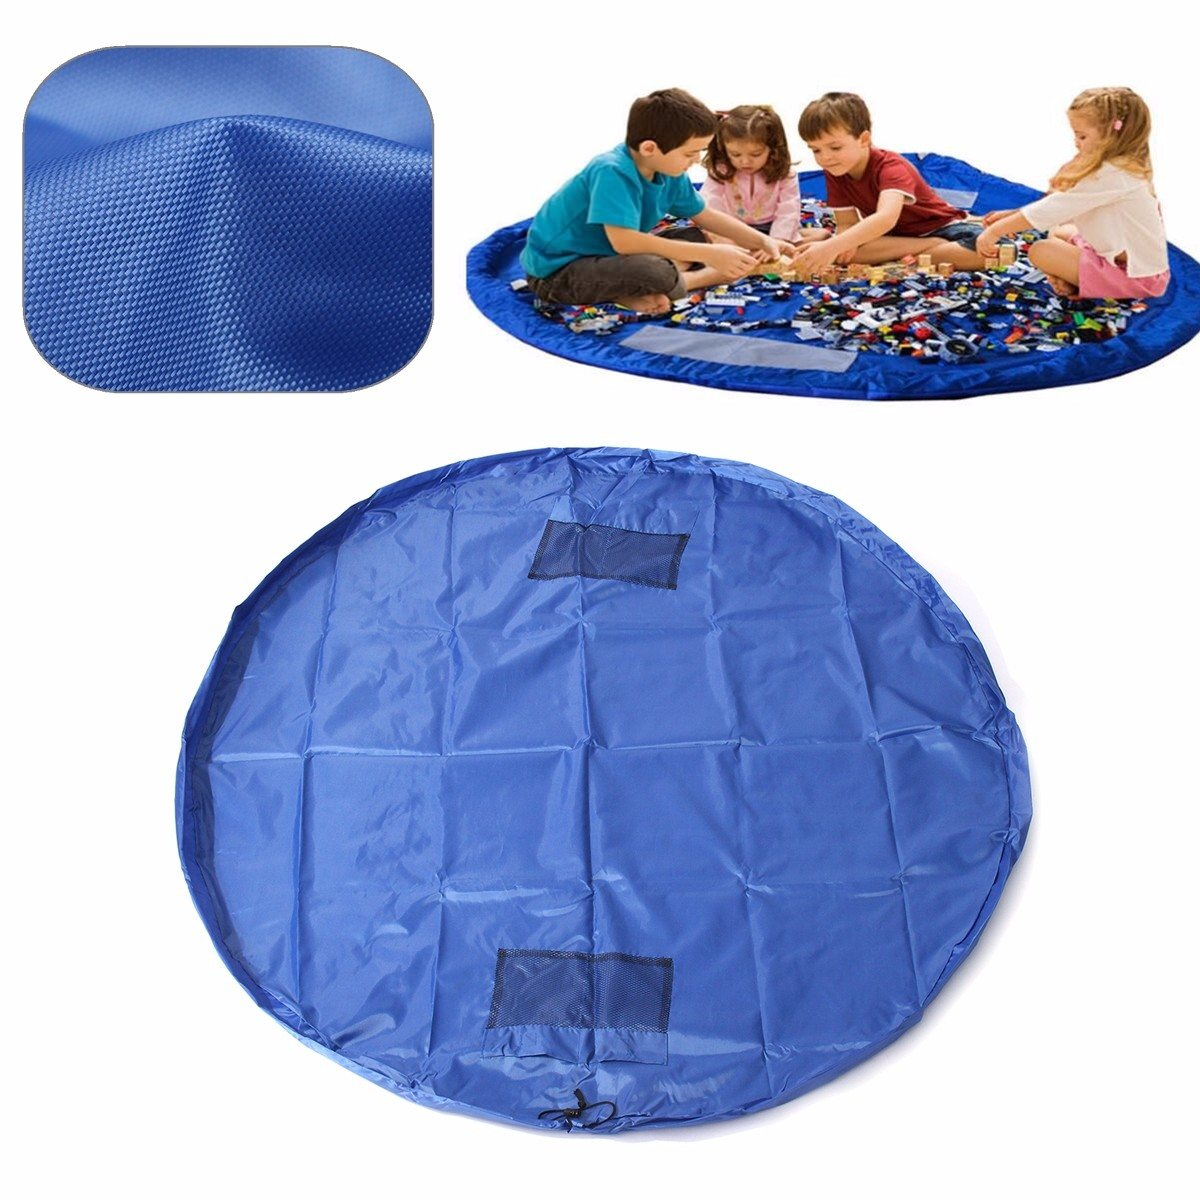 1PC 150cm Kids Play Mat Waterproof Play Mat Pink/Blue Multifunctional Toy Storage Bag Play Carpet For Children Kids